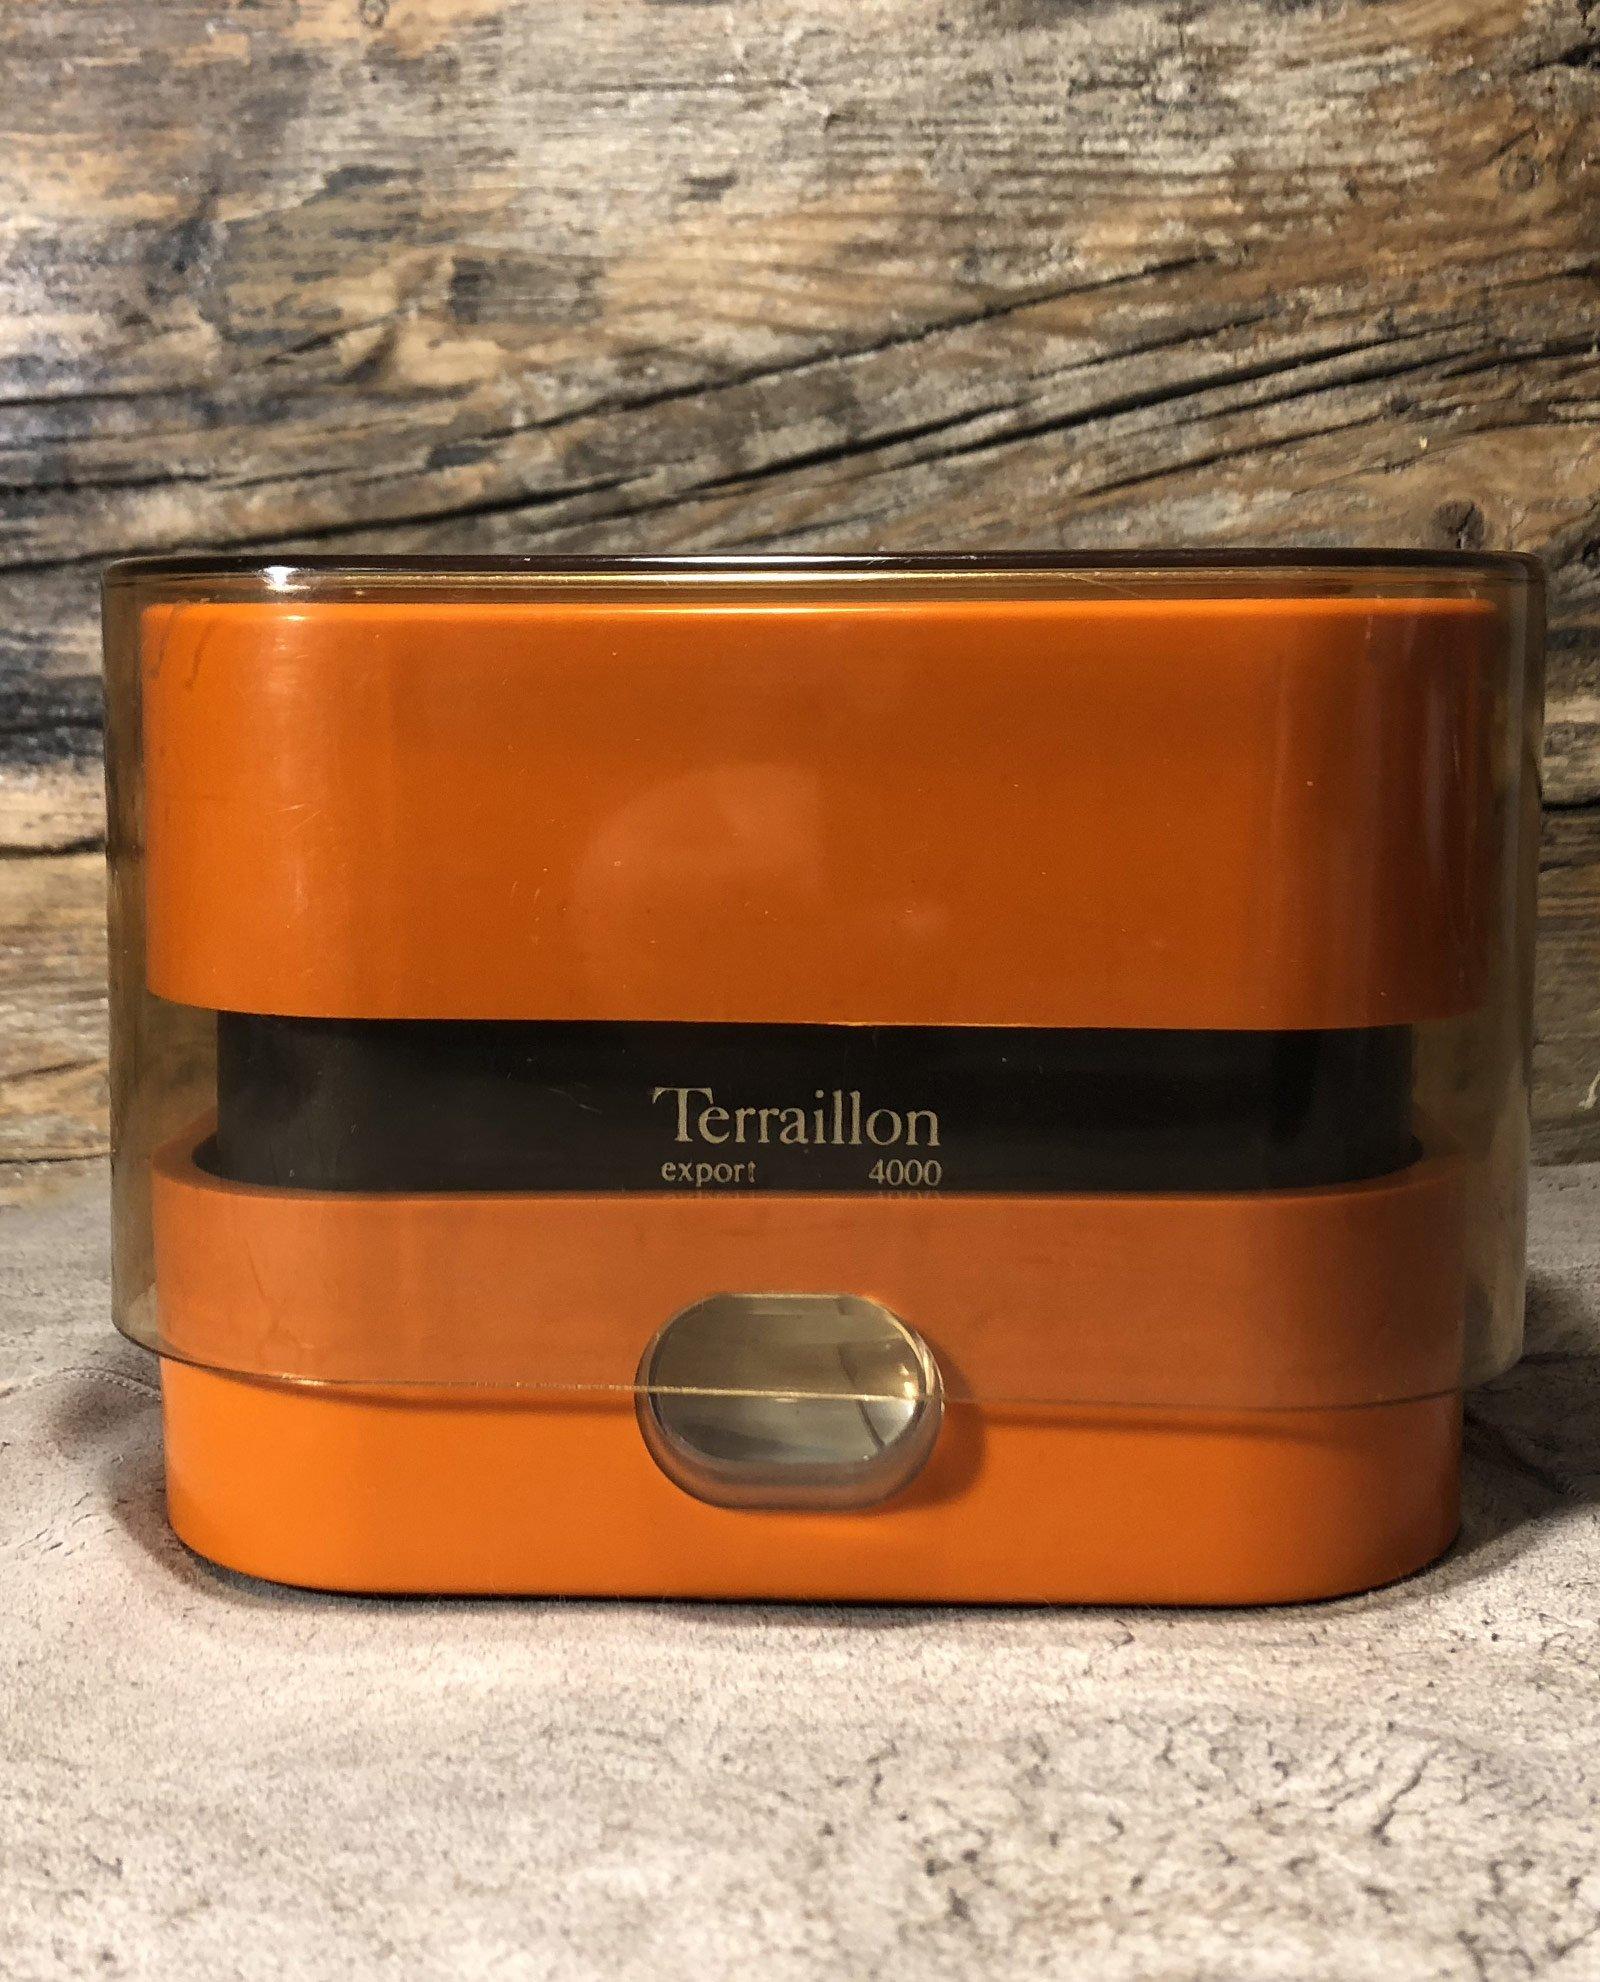 Bilancia da cucina Terraillon Export 4000 | Design Zanuso